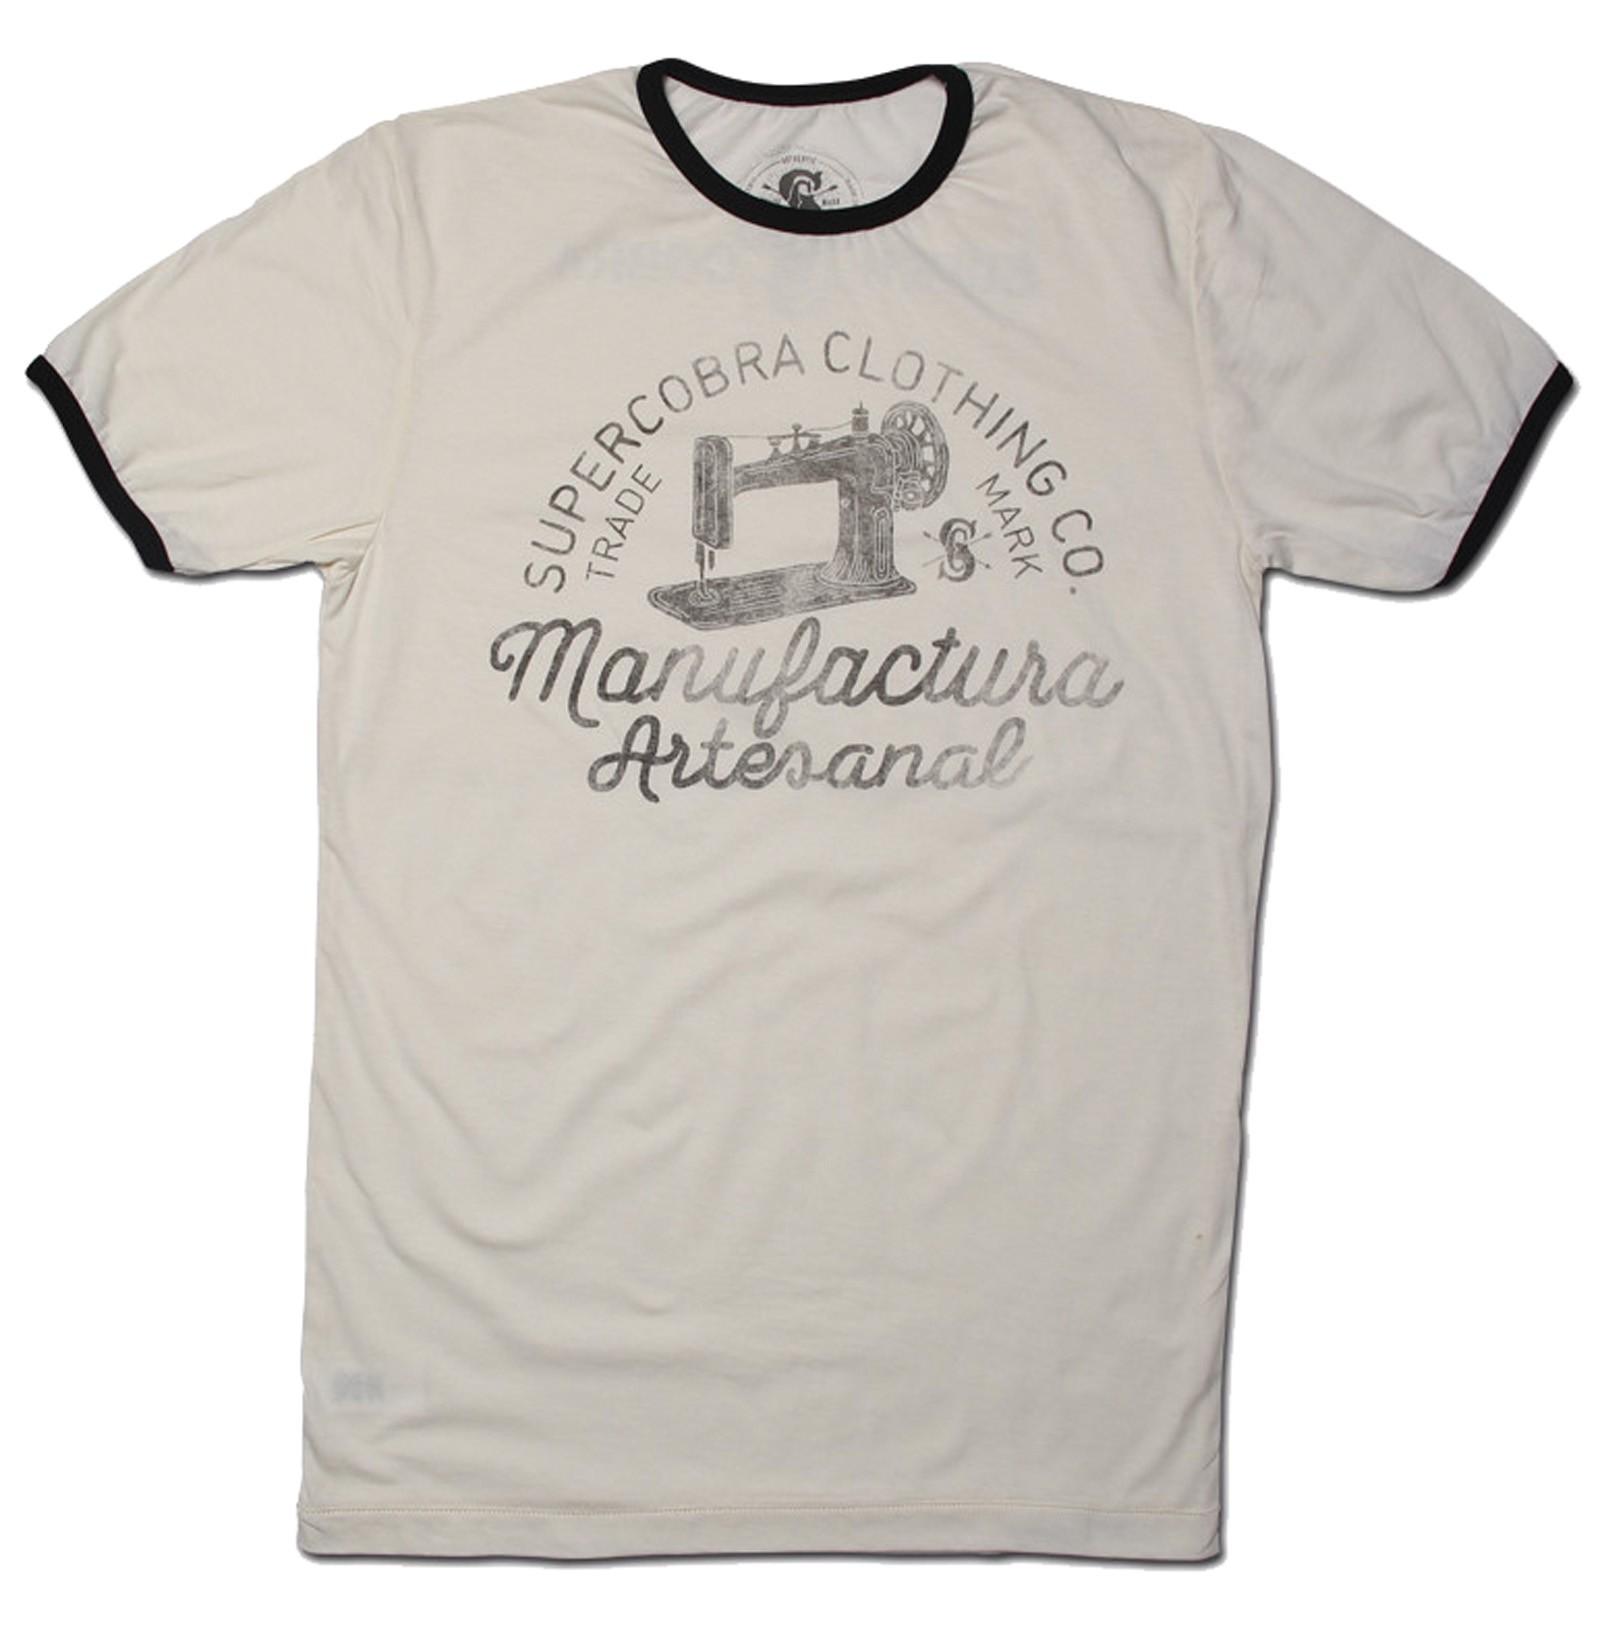 Supercobra Clothing Company - Manufactura Artesanal Ringer T-Shirt